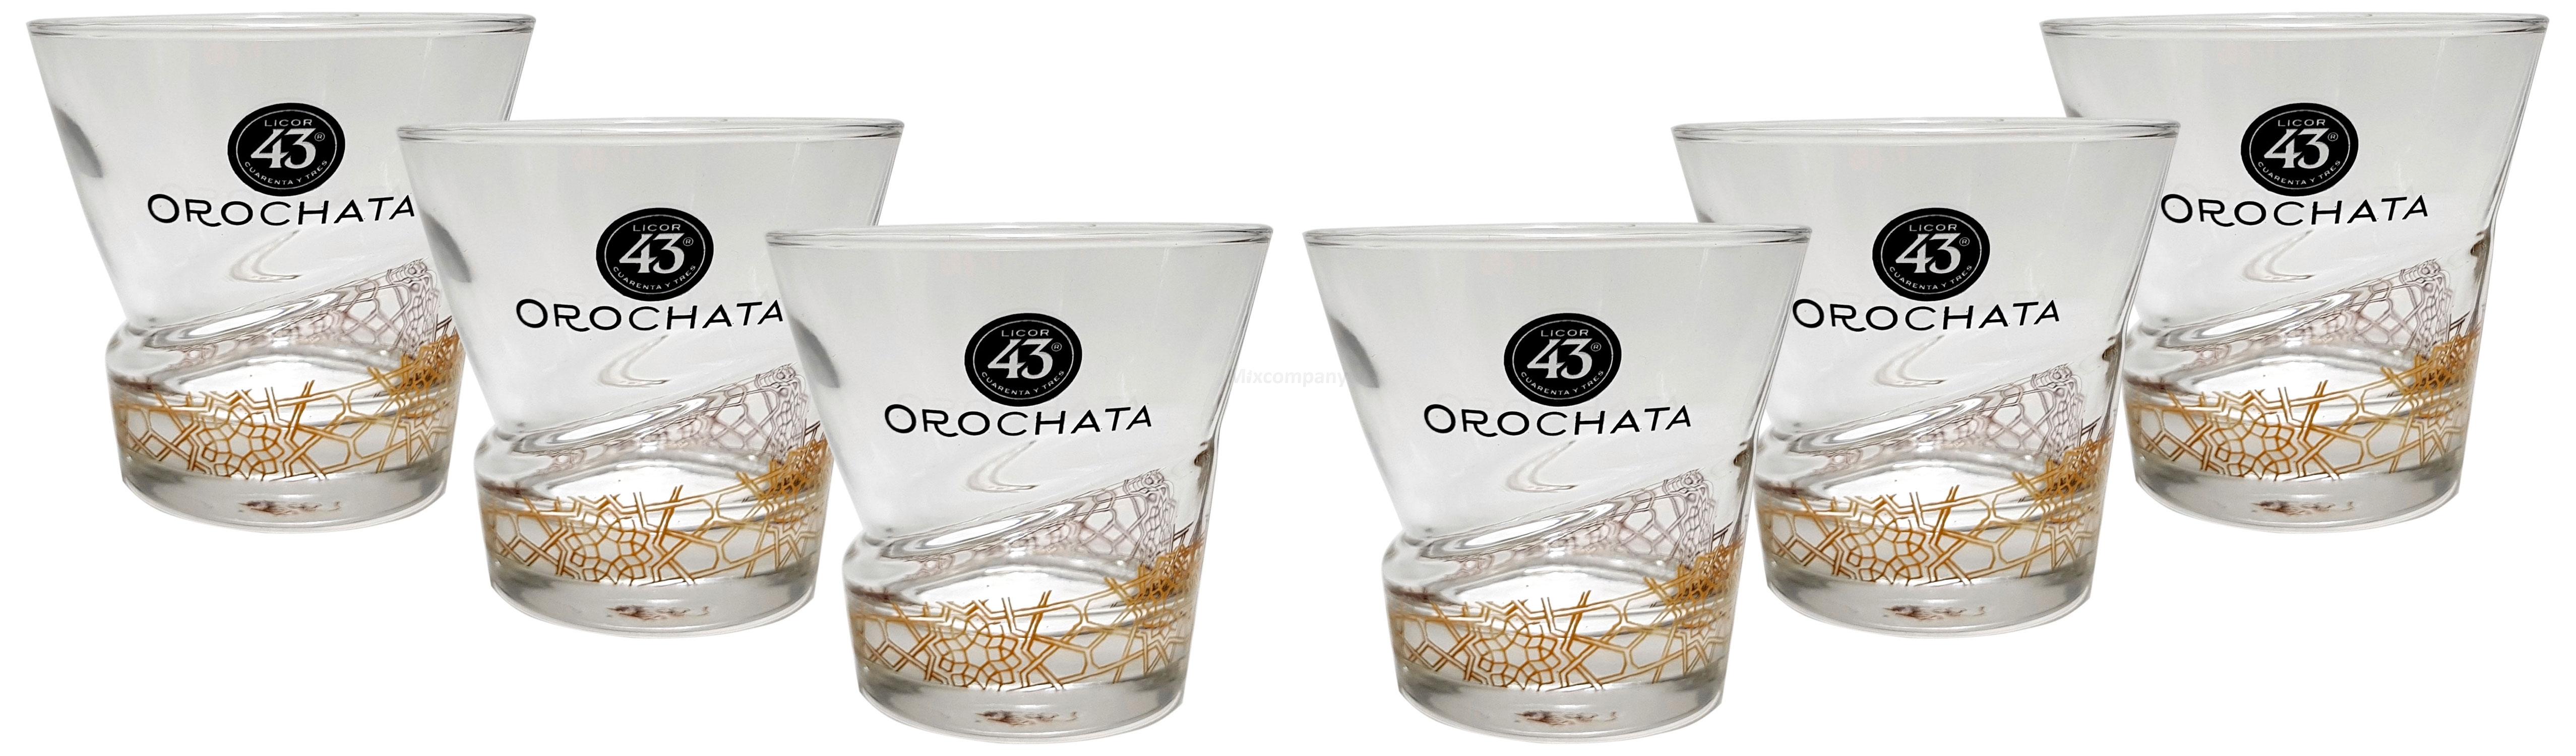 Orochata Tumbler licor 43 Cuarenta y Tres Glas Gläser-Set - 6x Tumbler Likör Liquor 43er